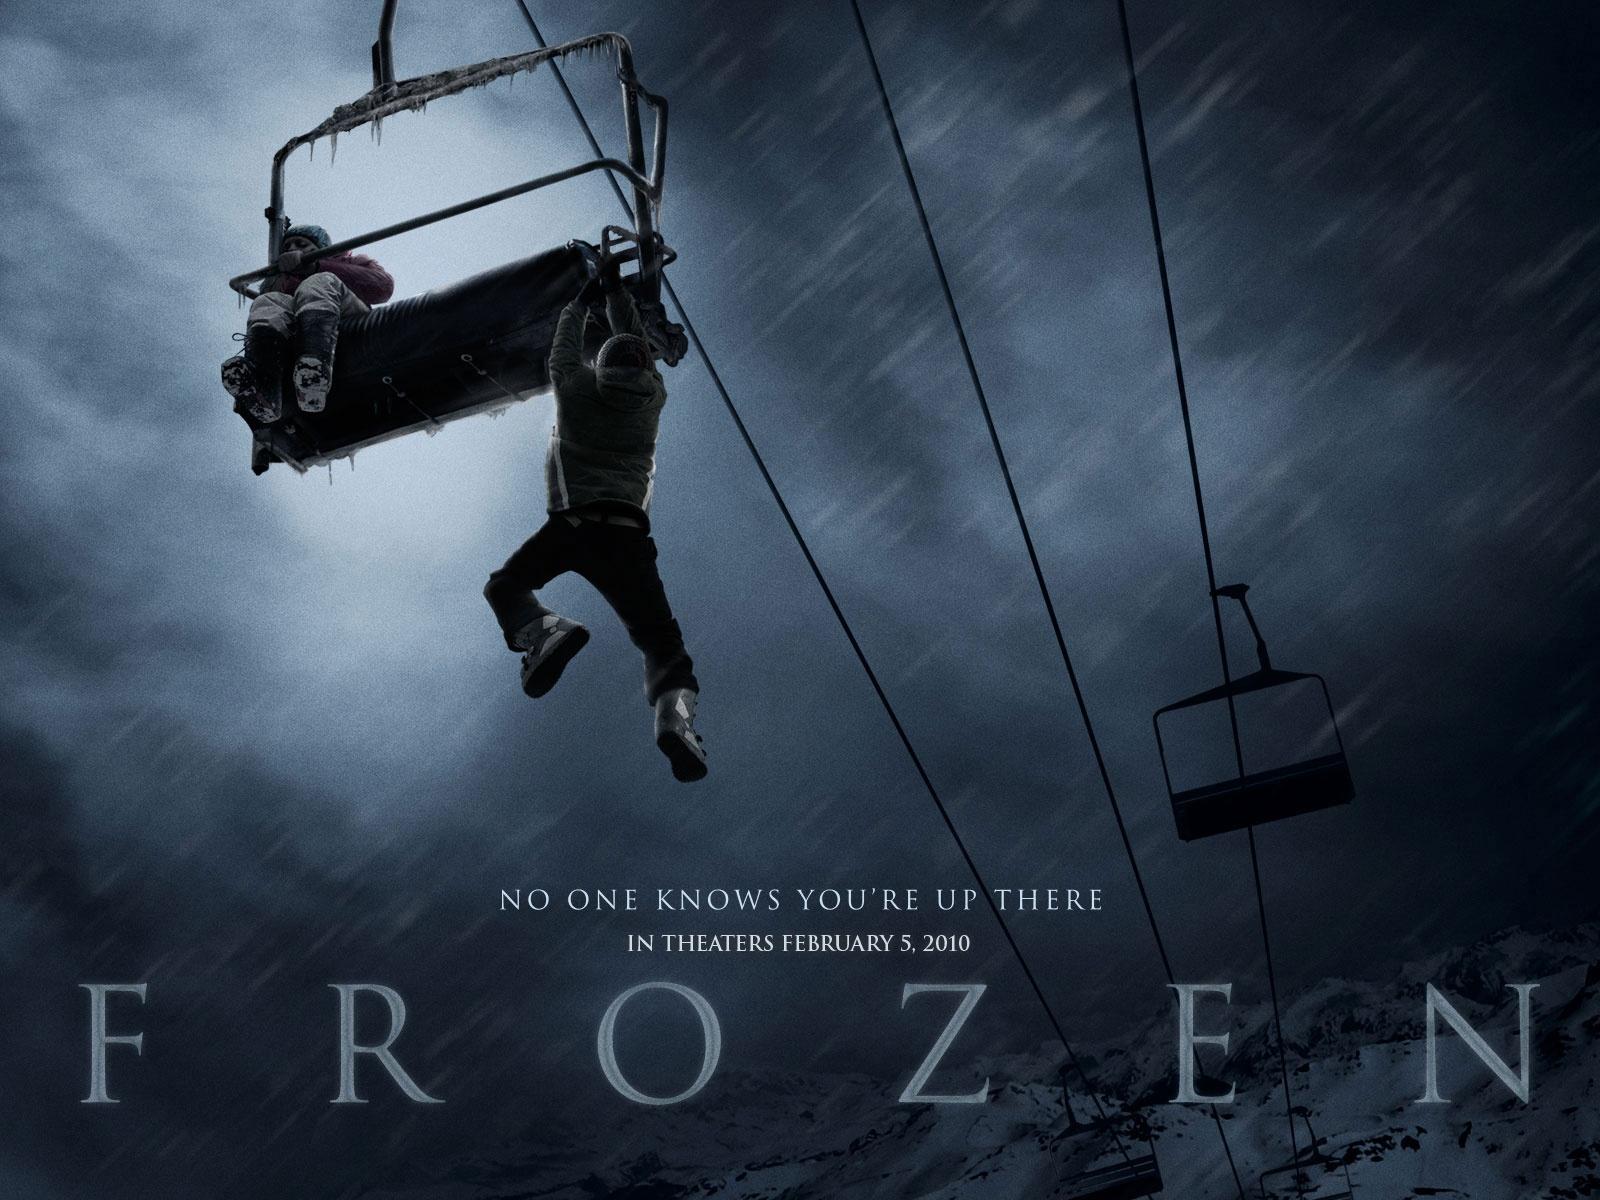 Muerte En La Montana: Historias De Terror: Frozen, Muerte En La Montaña, Bajo Cero